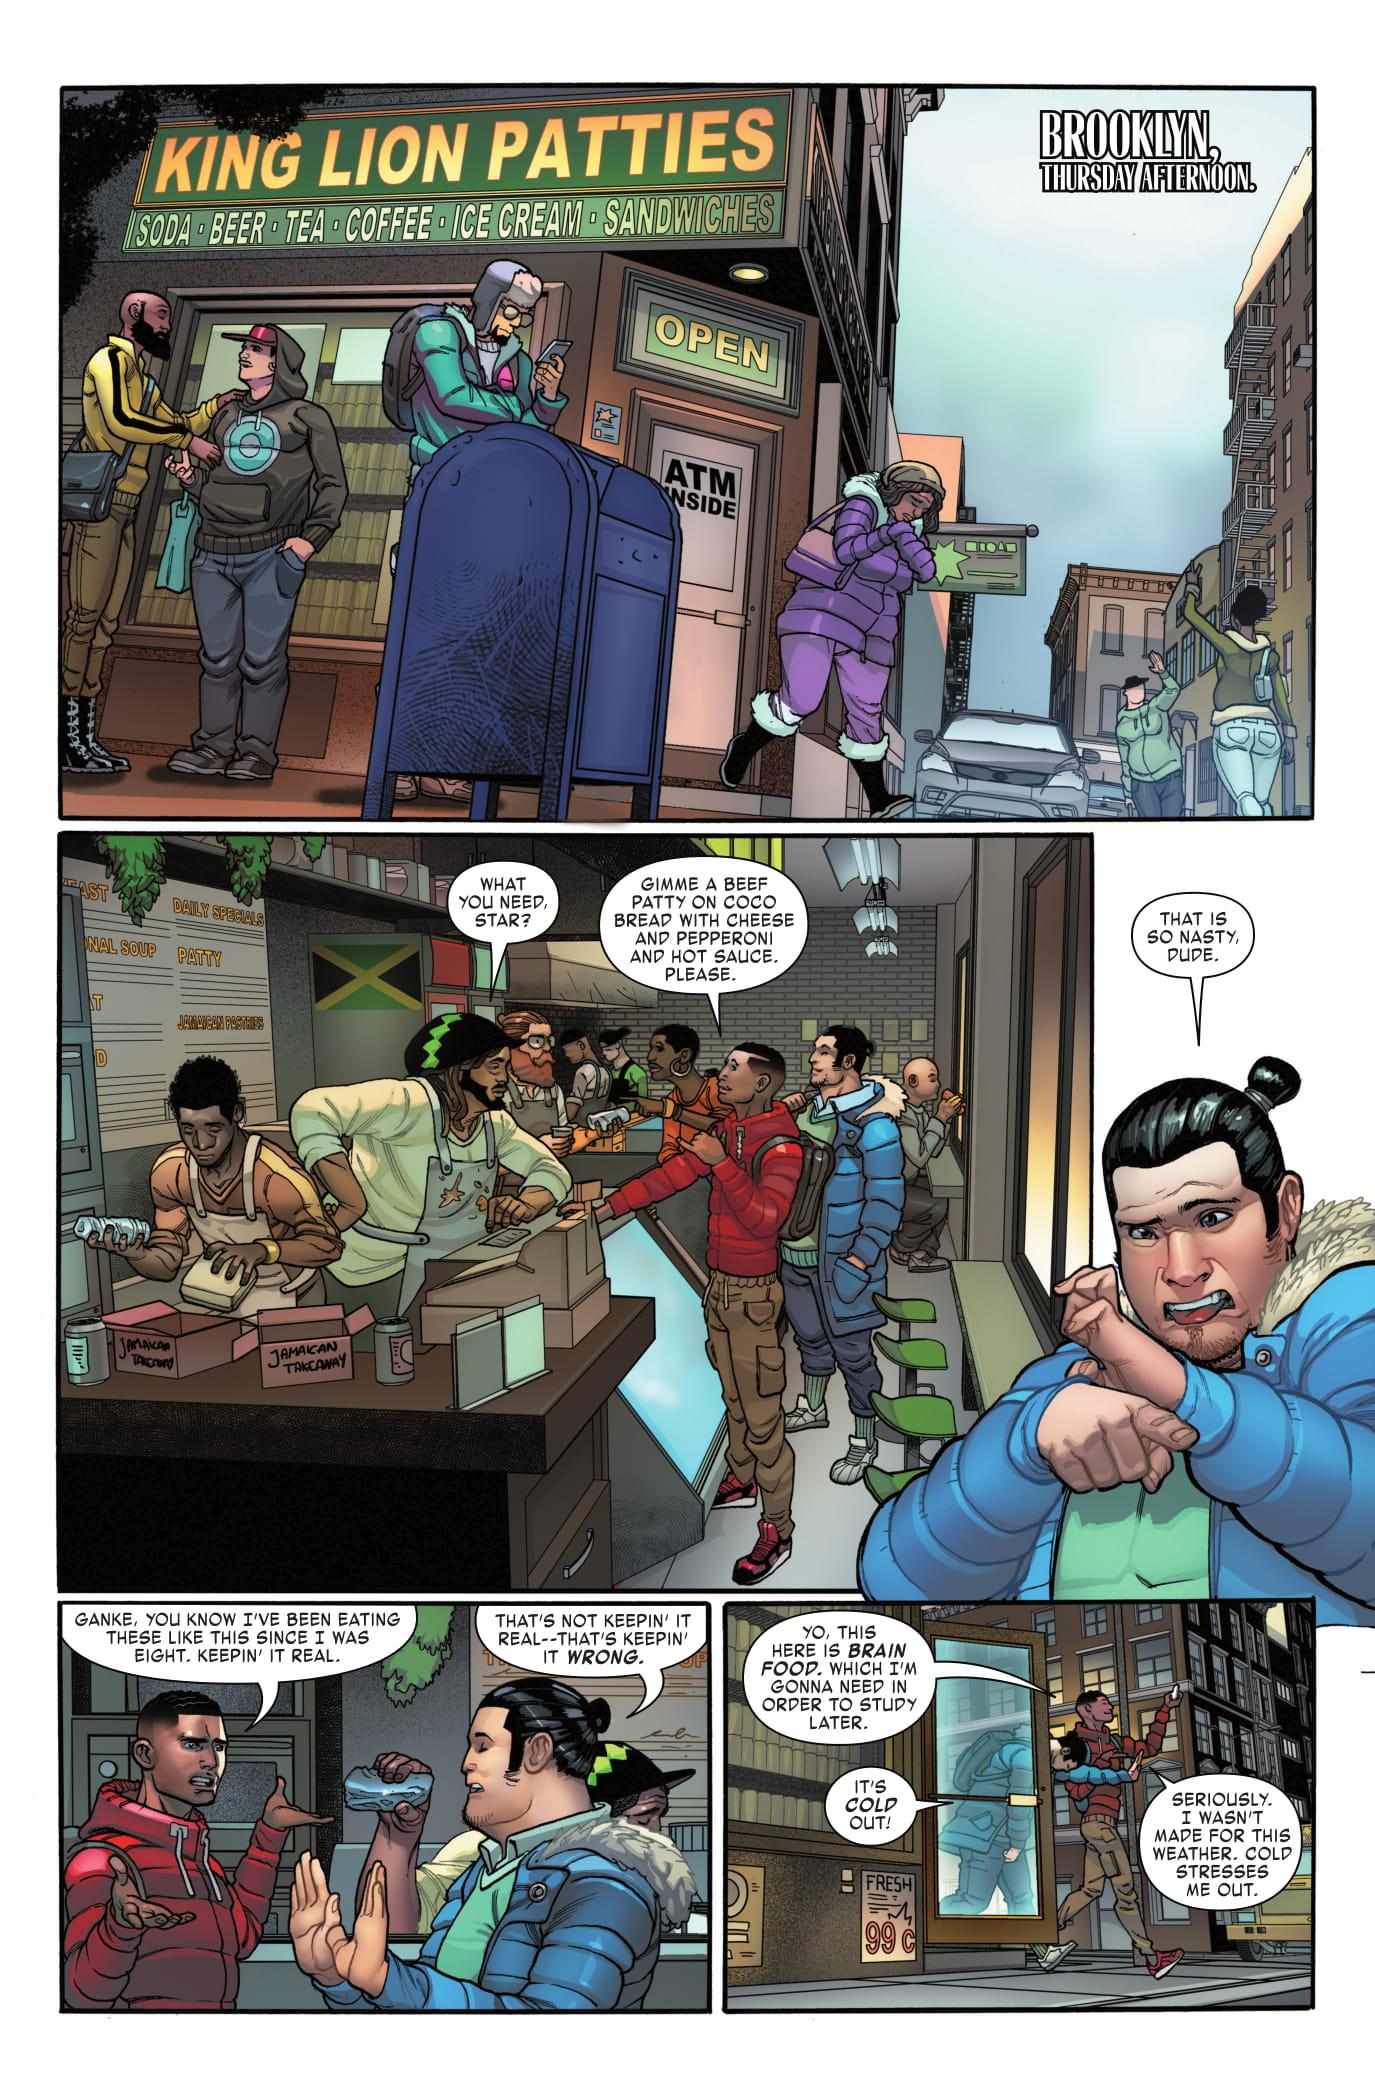 Miles Morales: Spider-Man #5 page 1